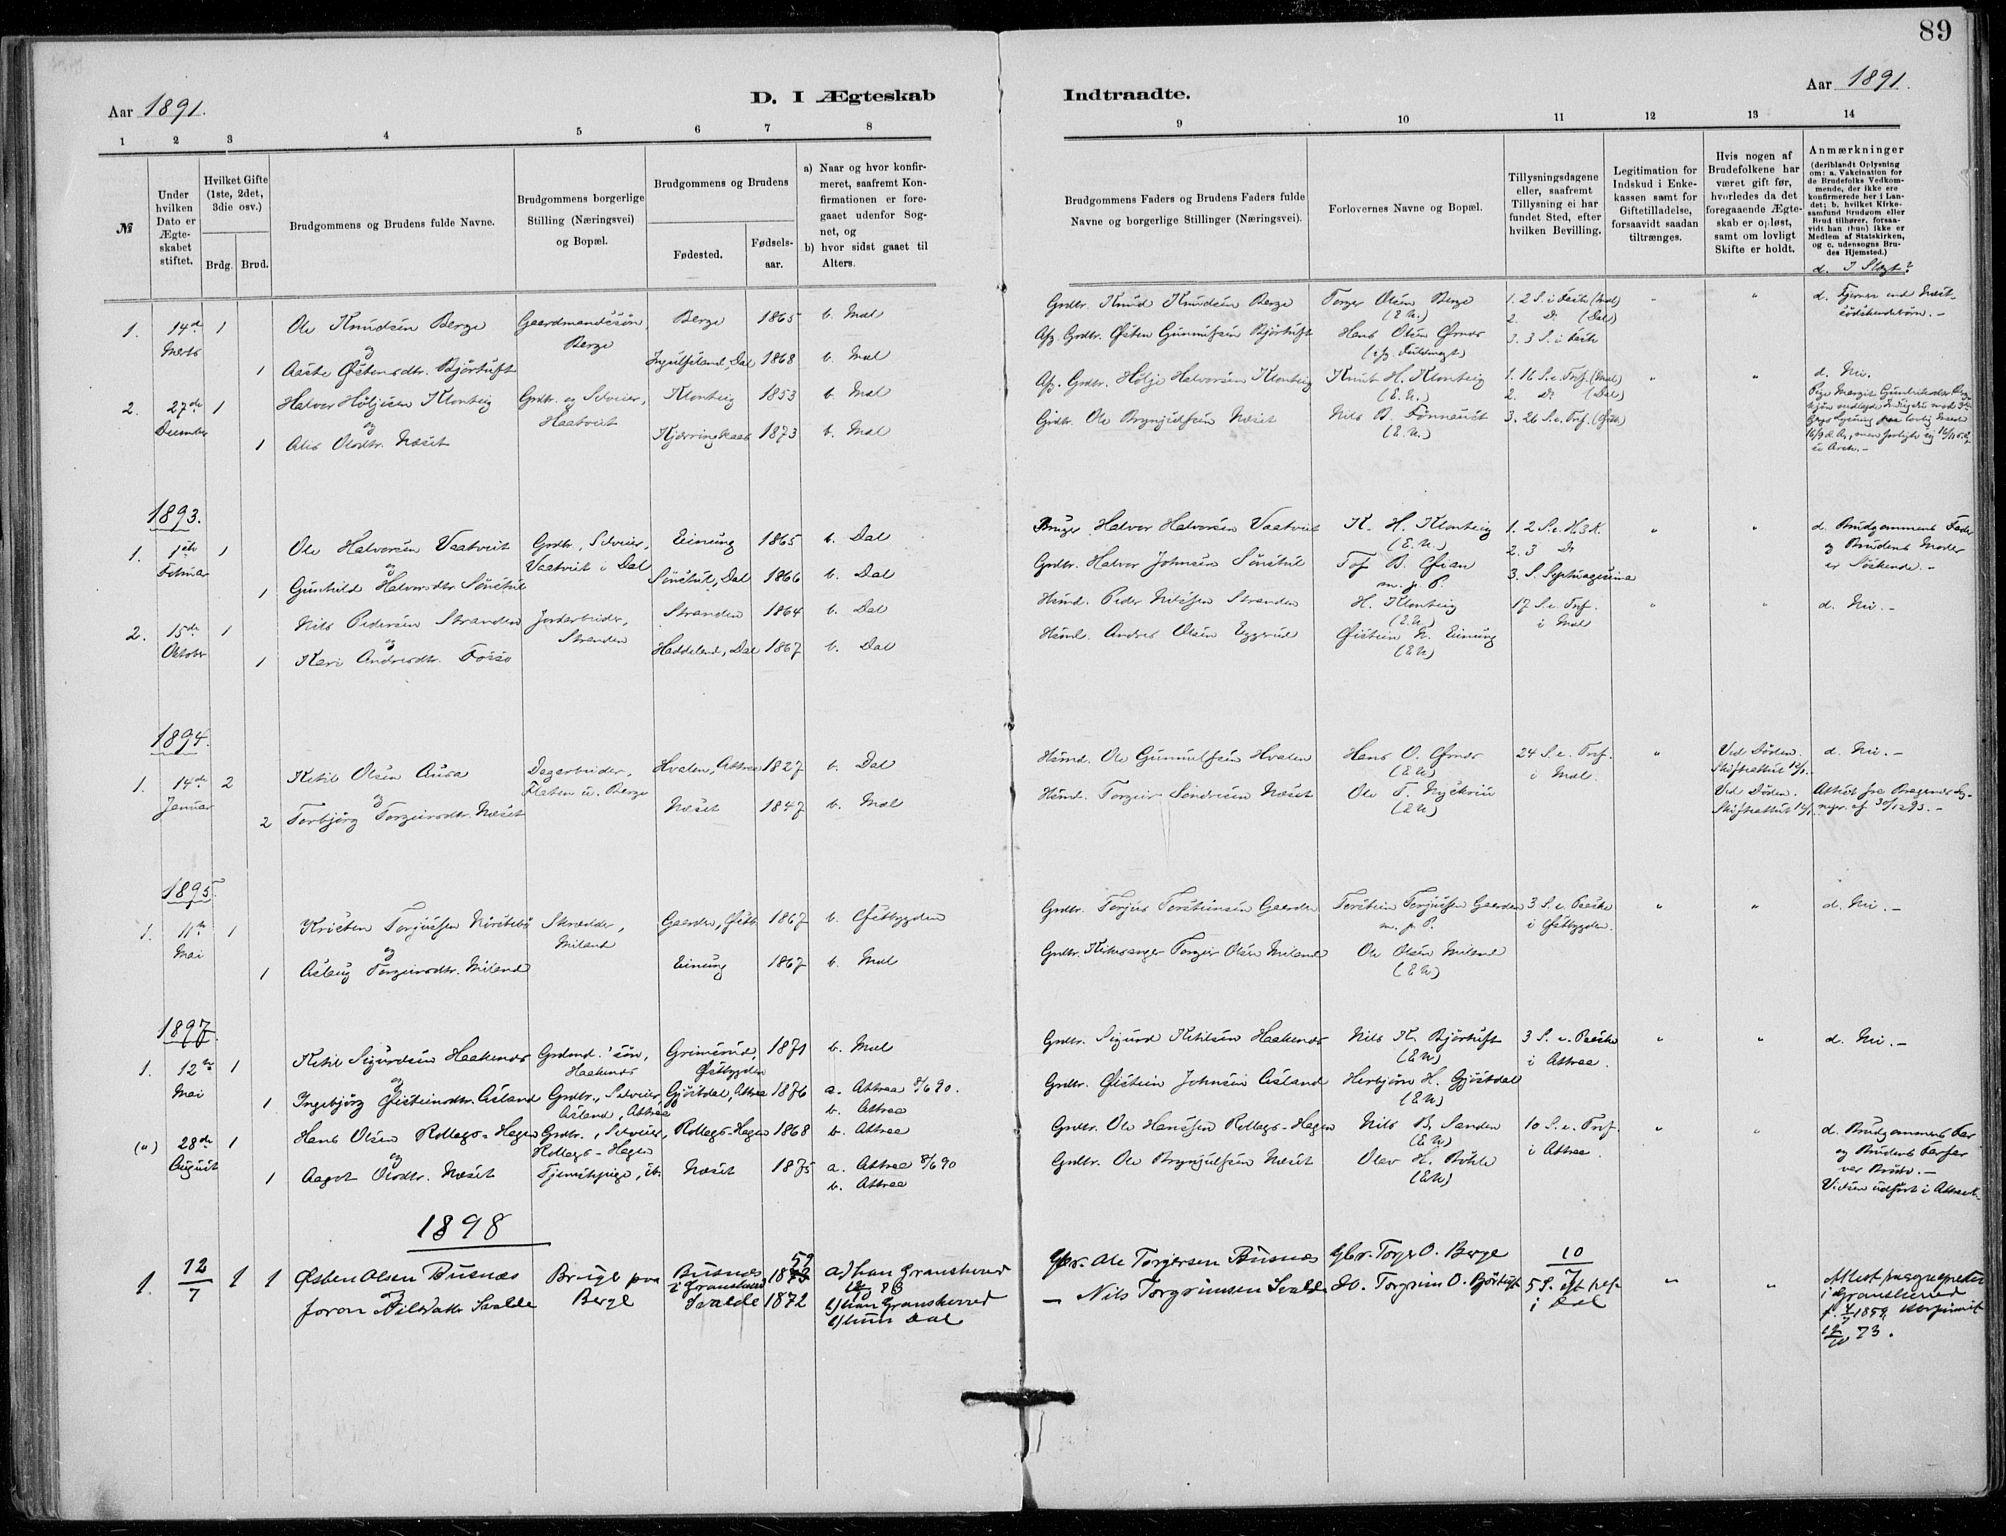 SAKO, Tinn kirkebøker, F/Fb/L0002: Ministerialbok nr. II 2, 1878-1917, s. 89